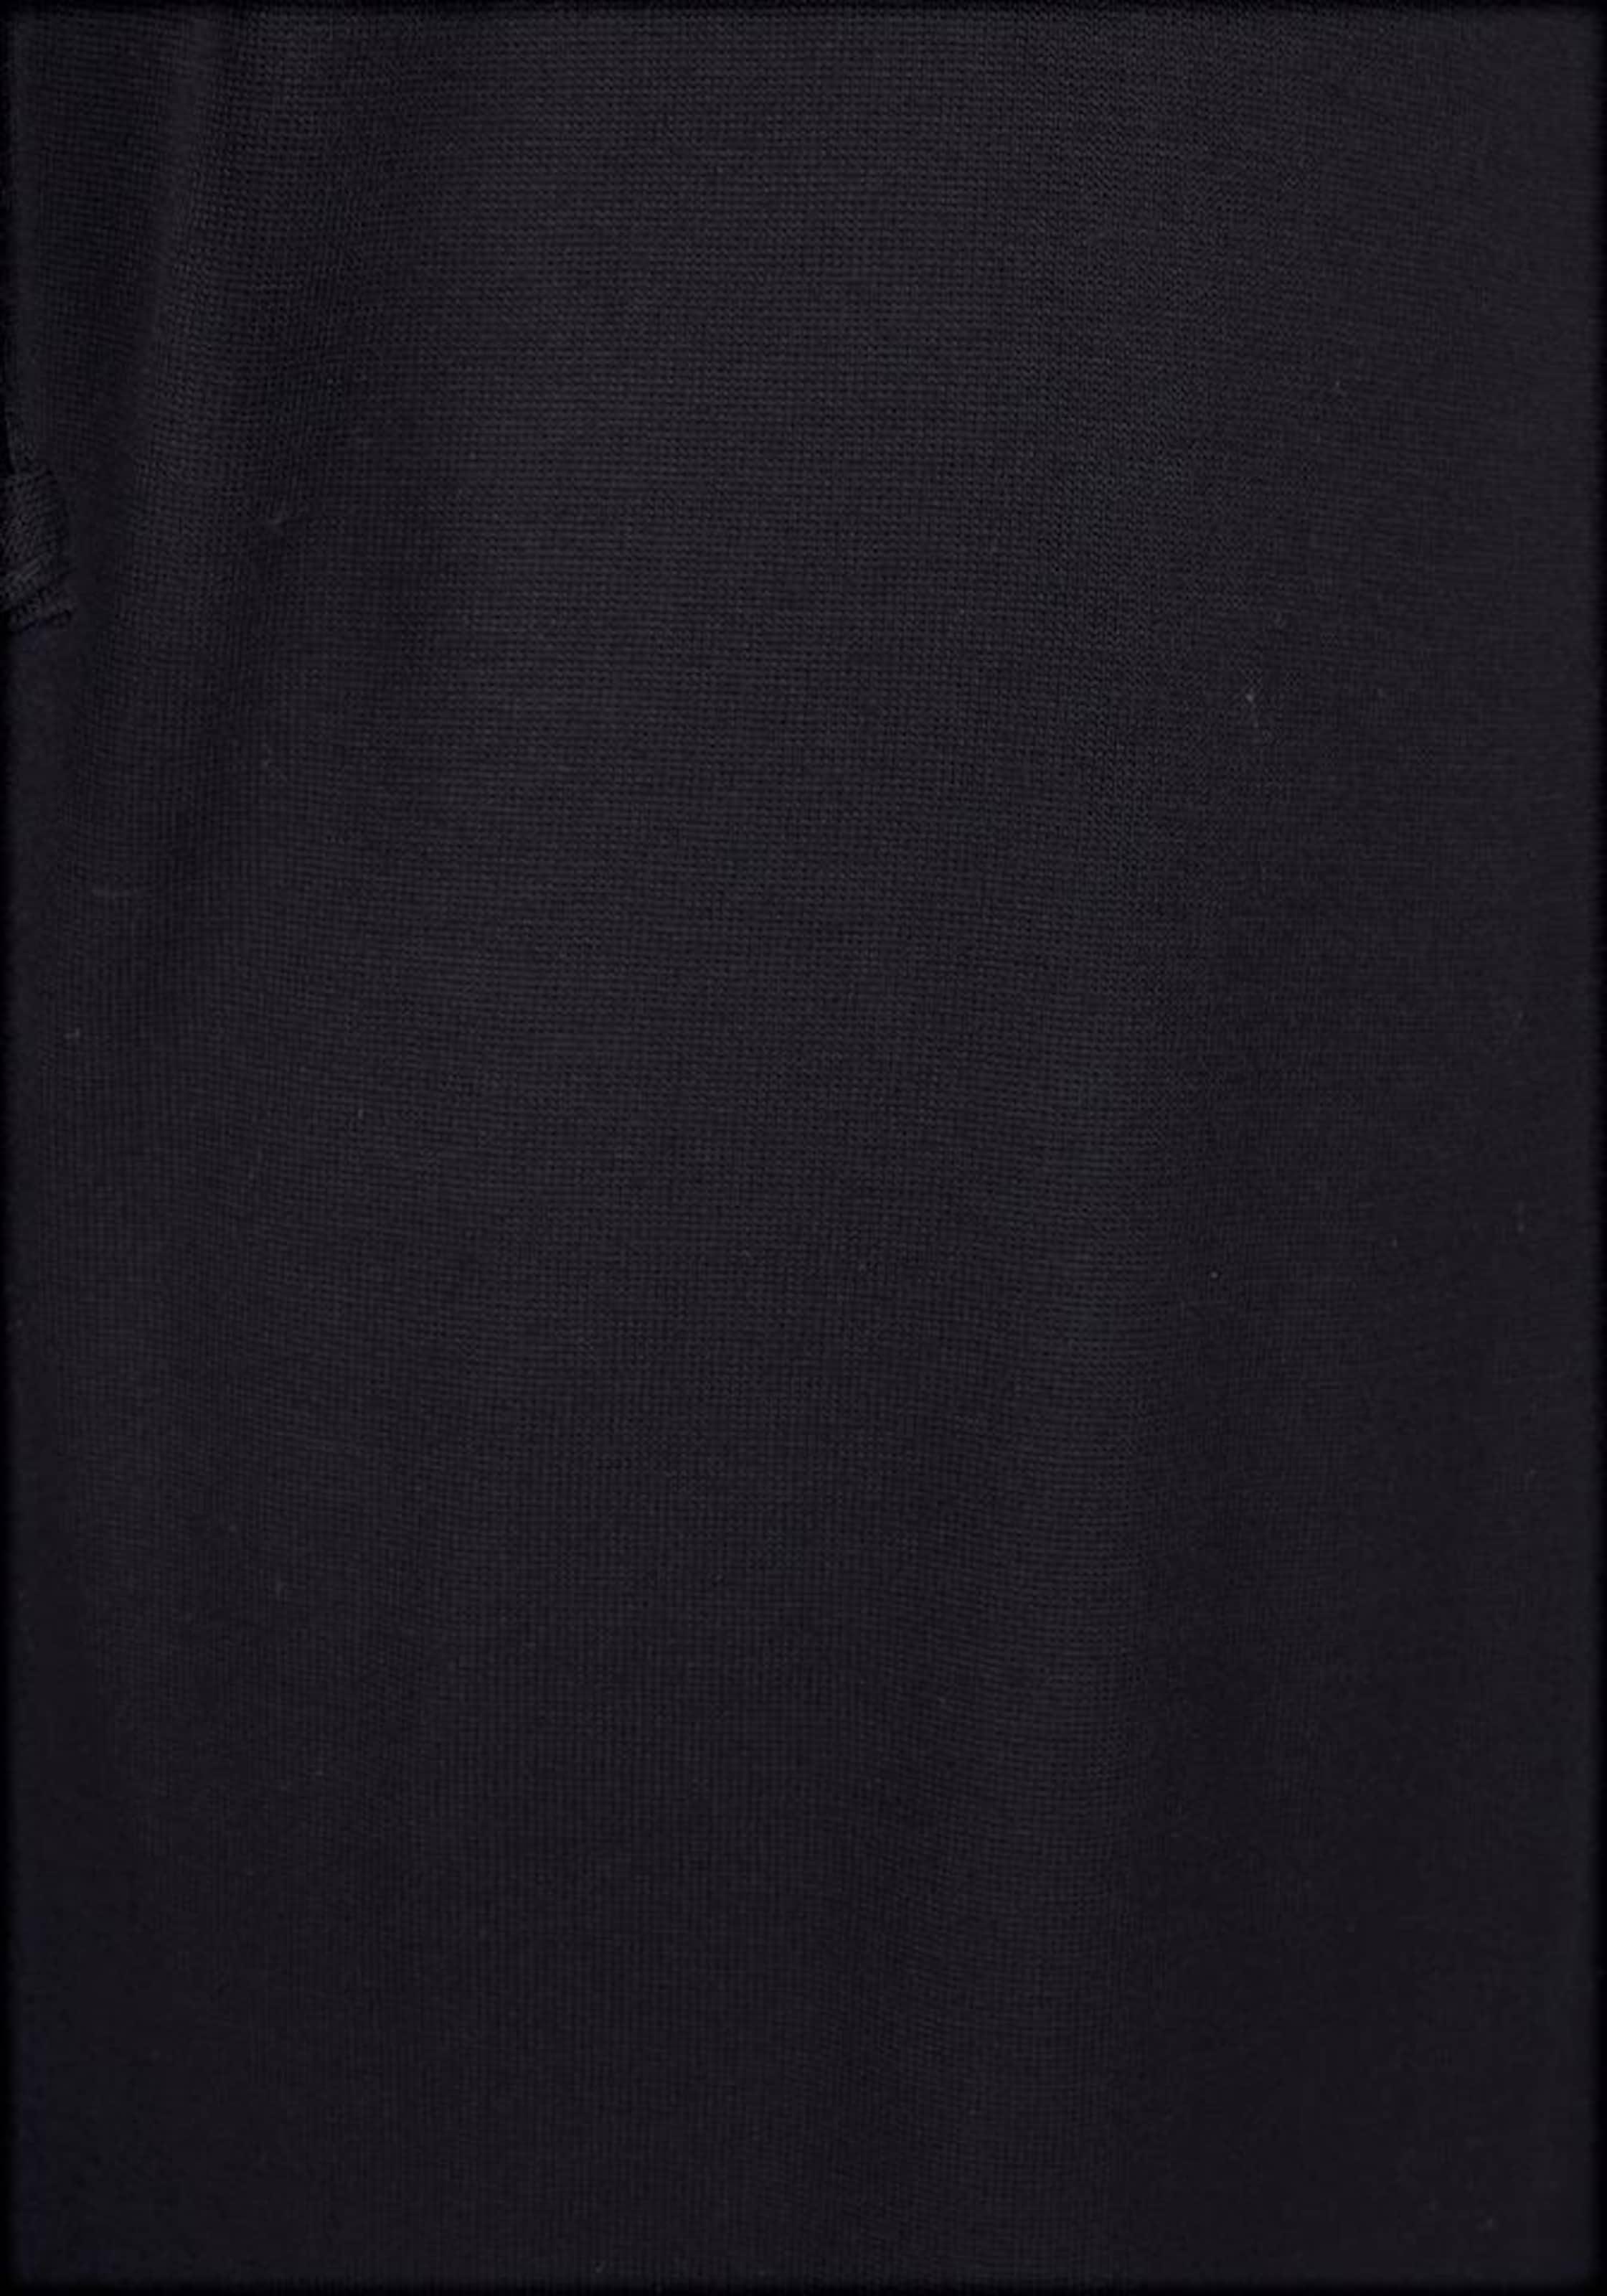 Zwart Zwart In In Lascana Jumpsuit Lascana Jumpsuit WEH9D2I